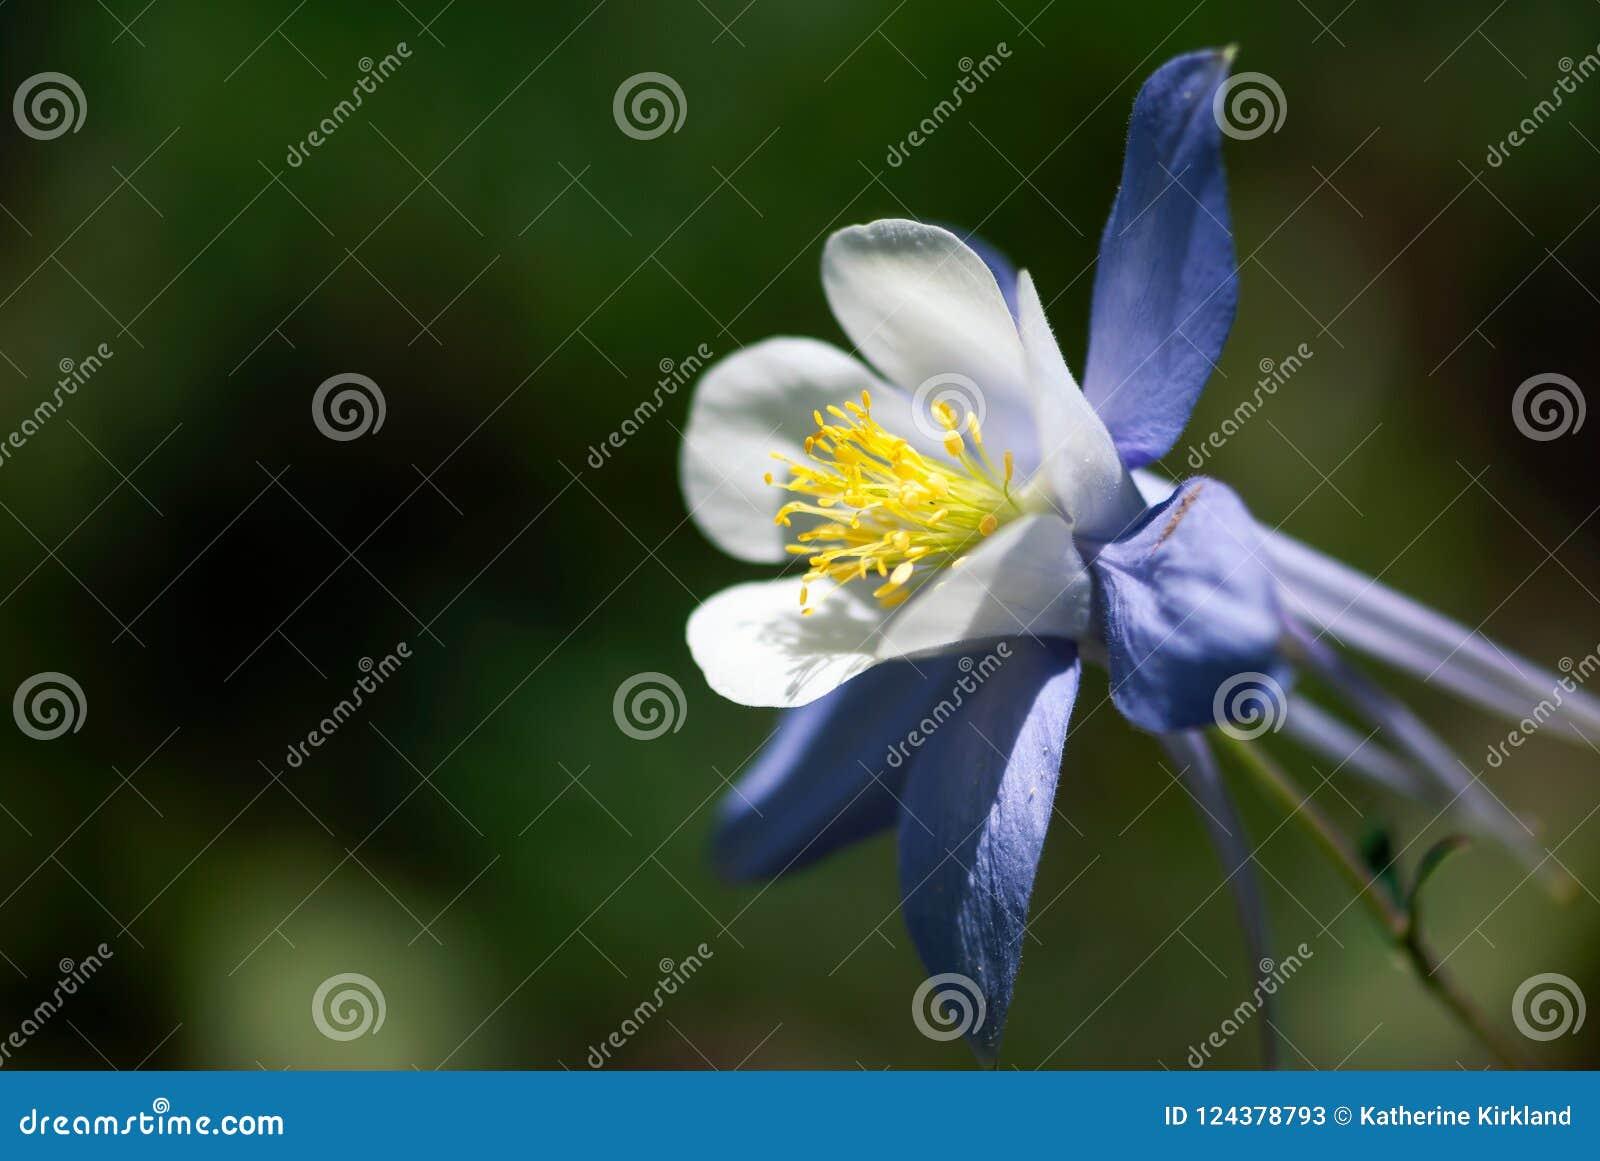 Rocky Mountain Columbine Stock Image Image Of Fragile 124378793